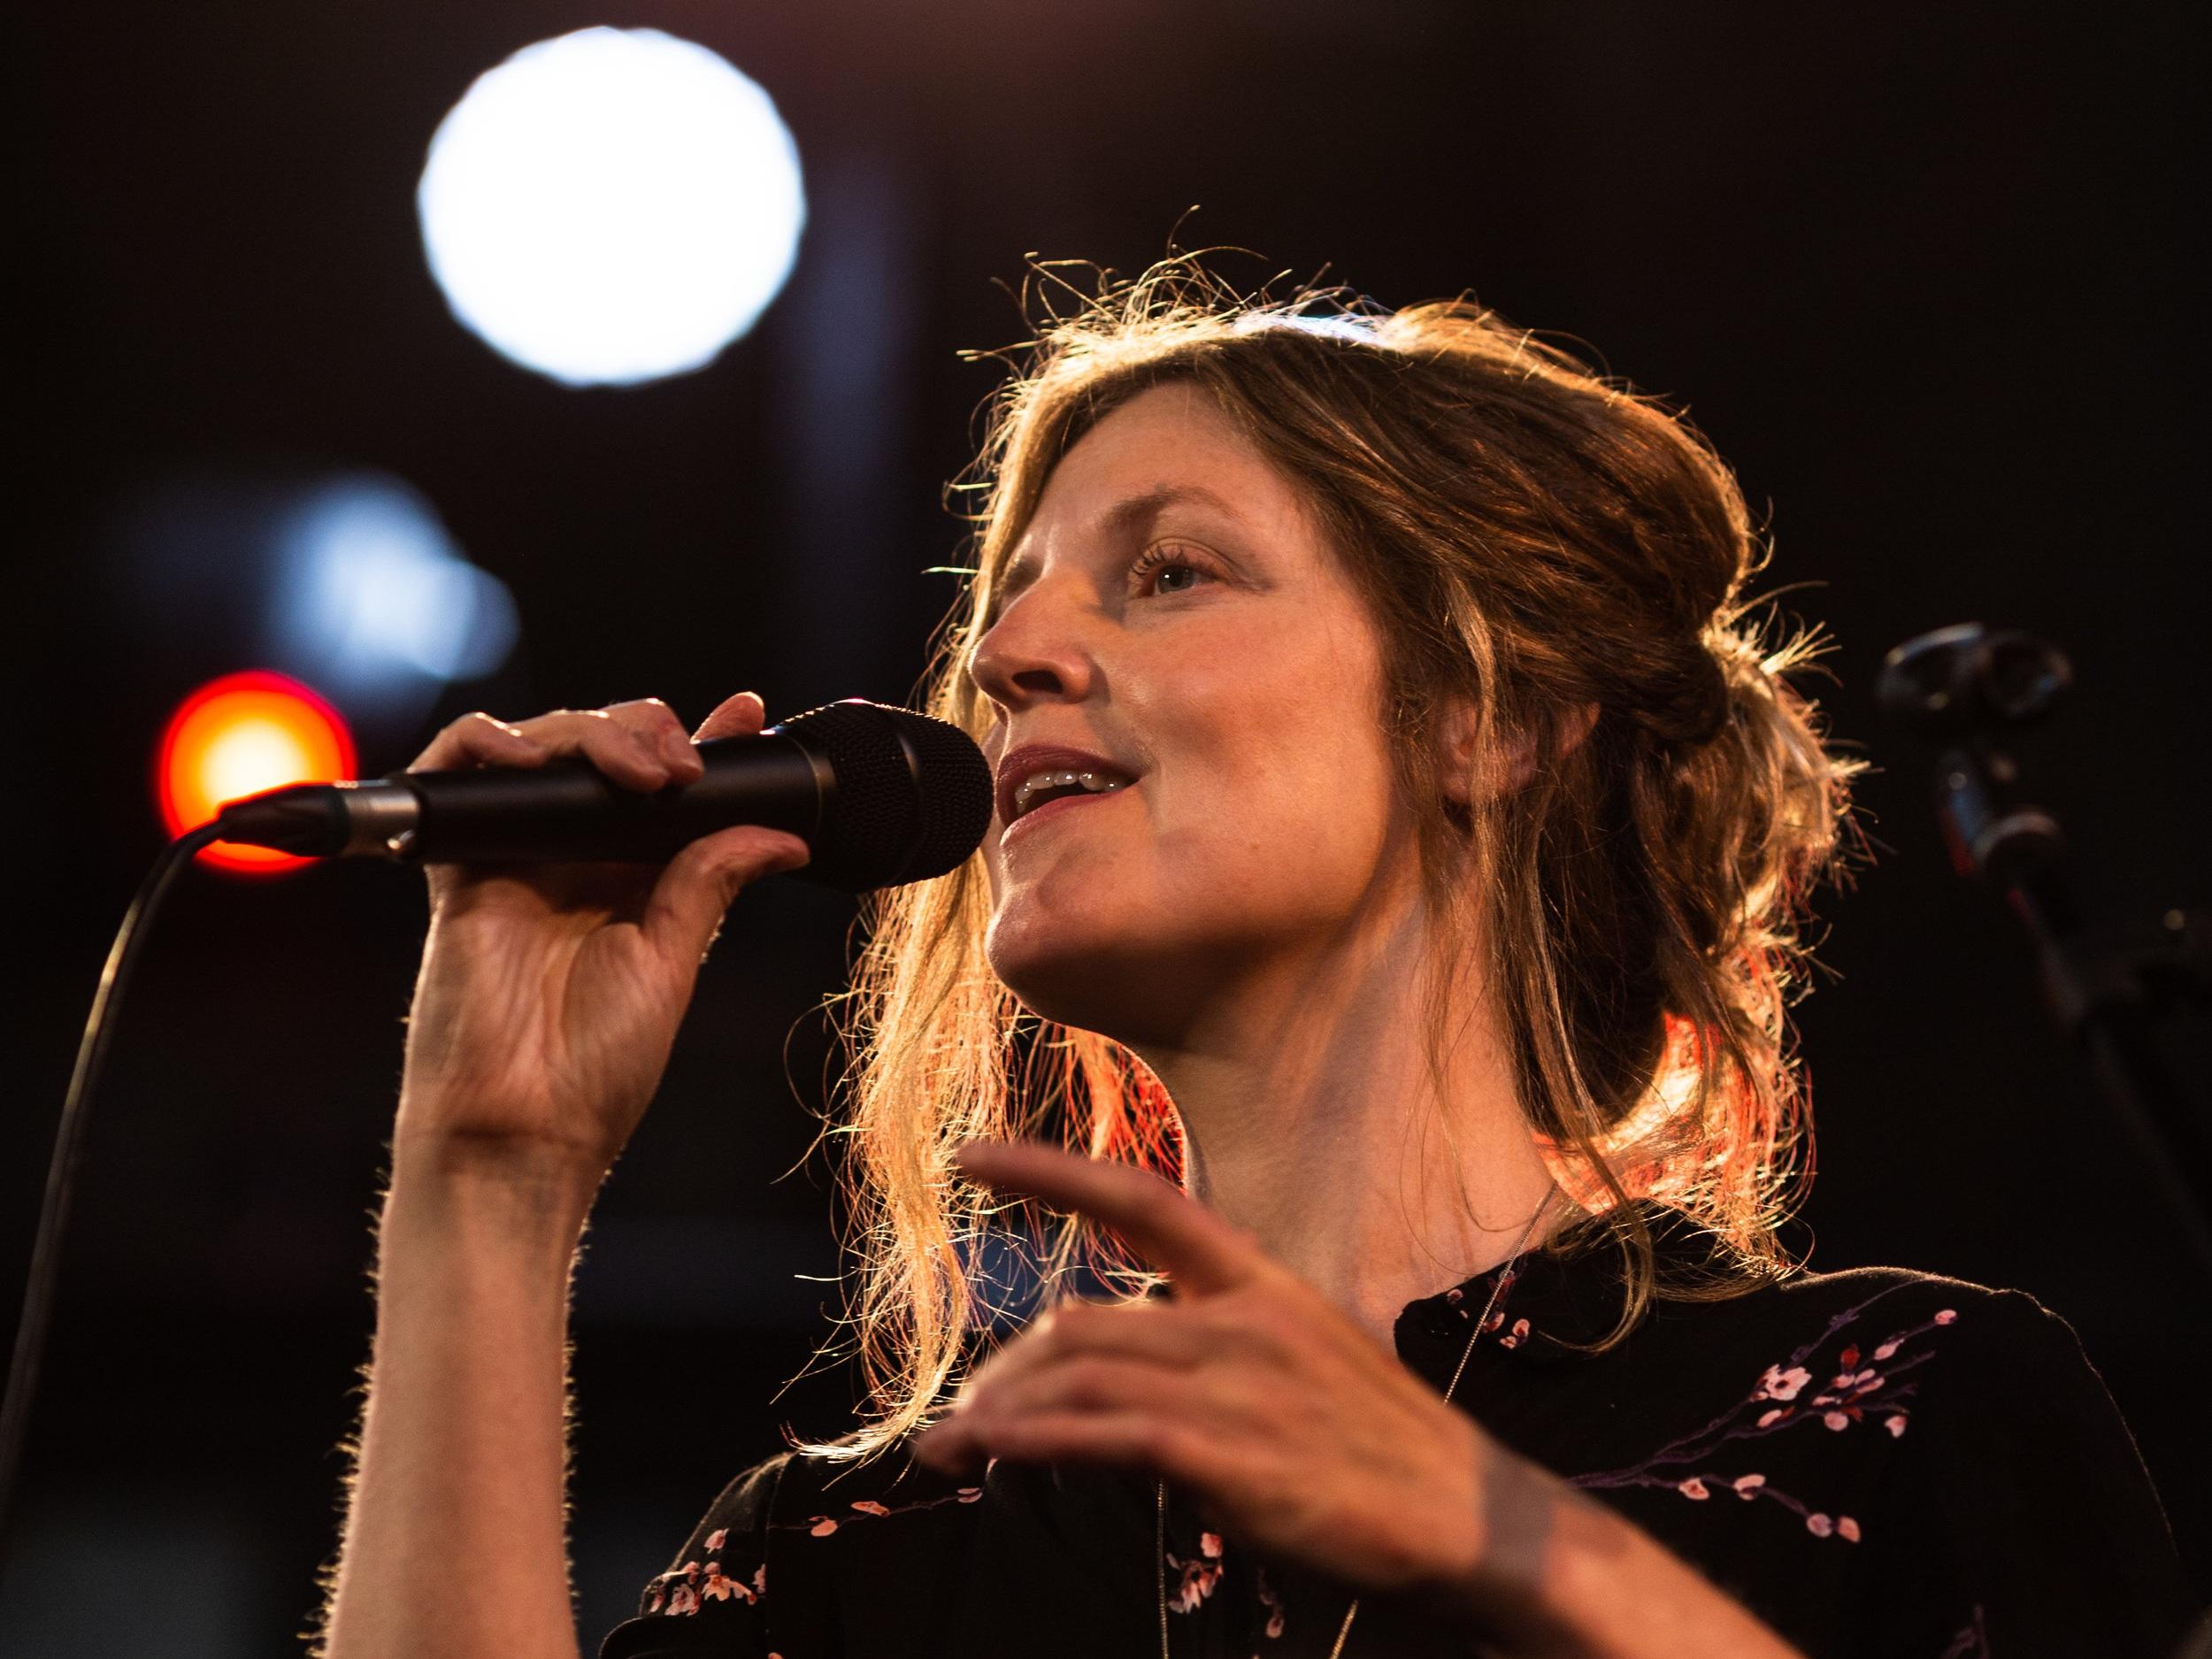 """Fine improvising vocalist - the powerful, freewheeling Lauren Kinsella"" - John Fordham, The Guardian"